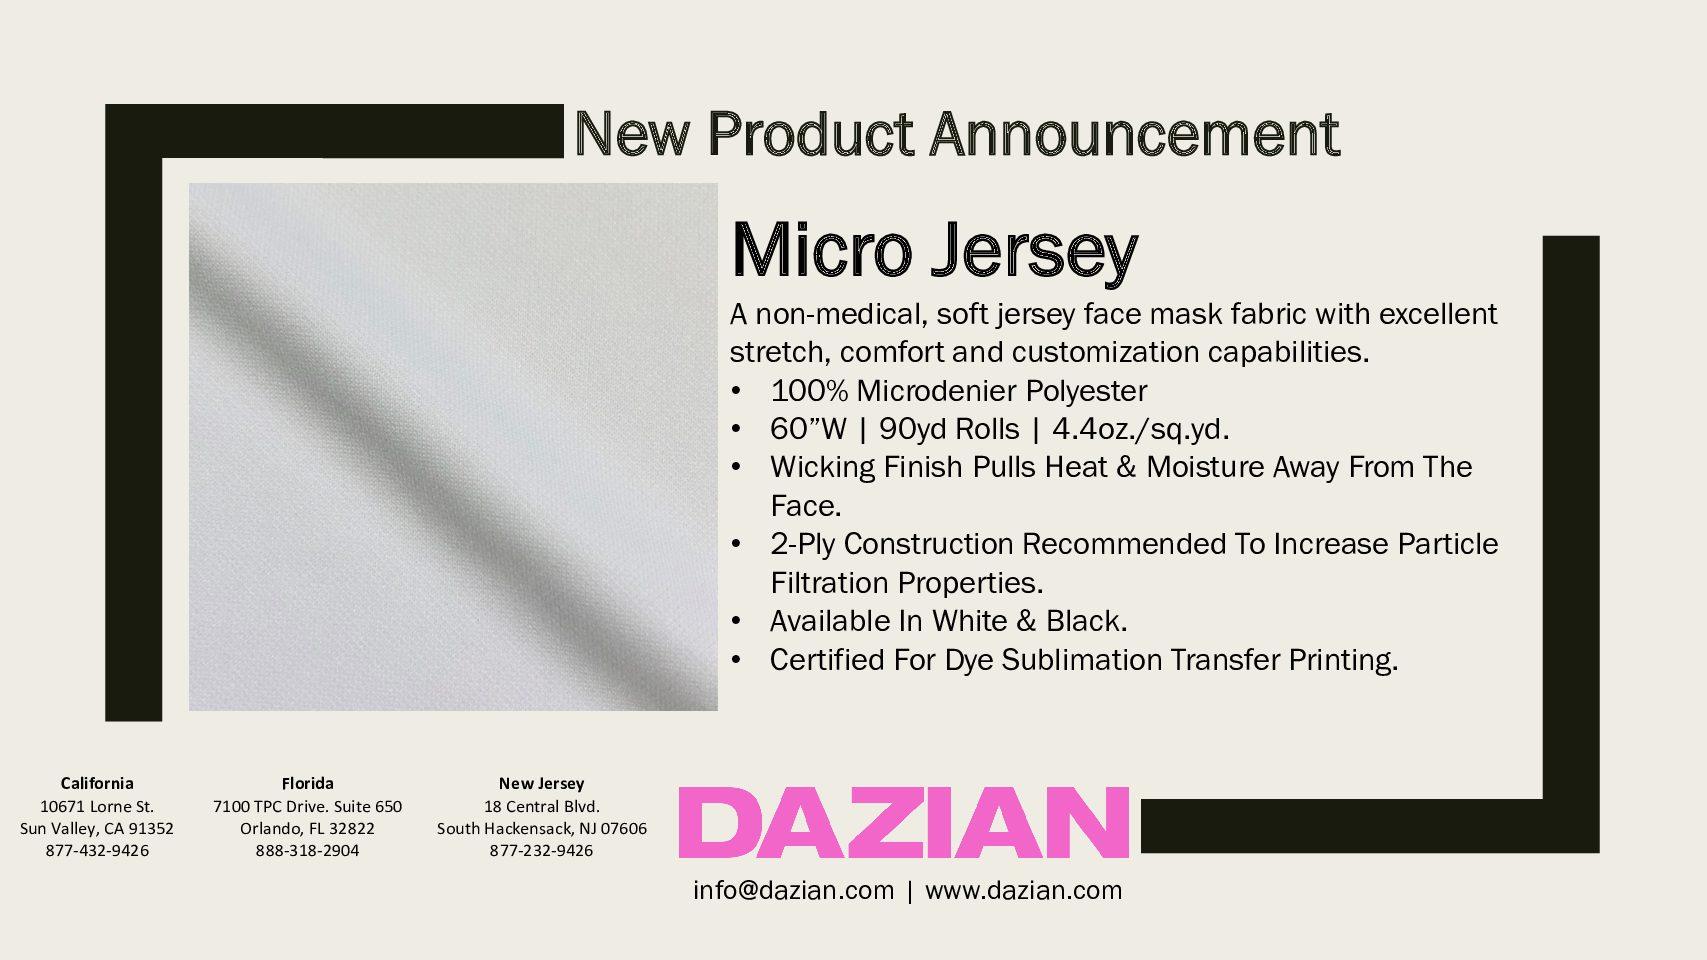 Micro Jersey